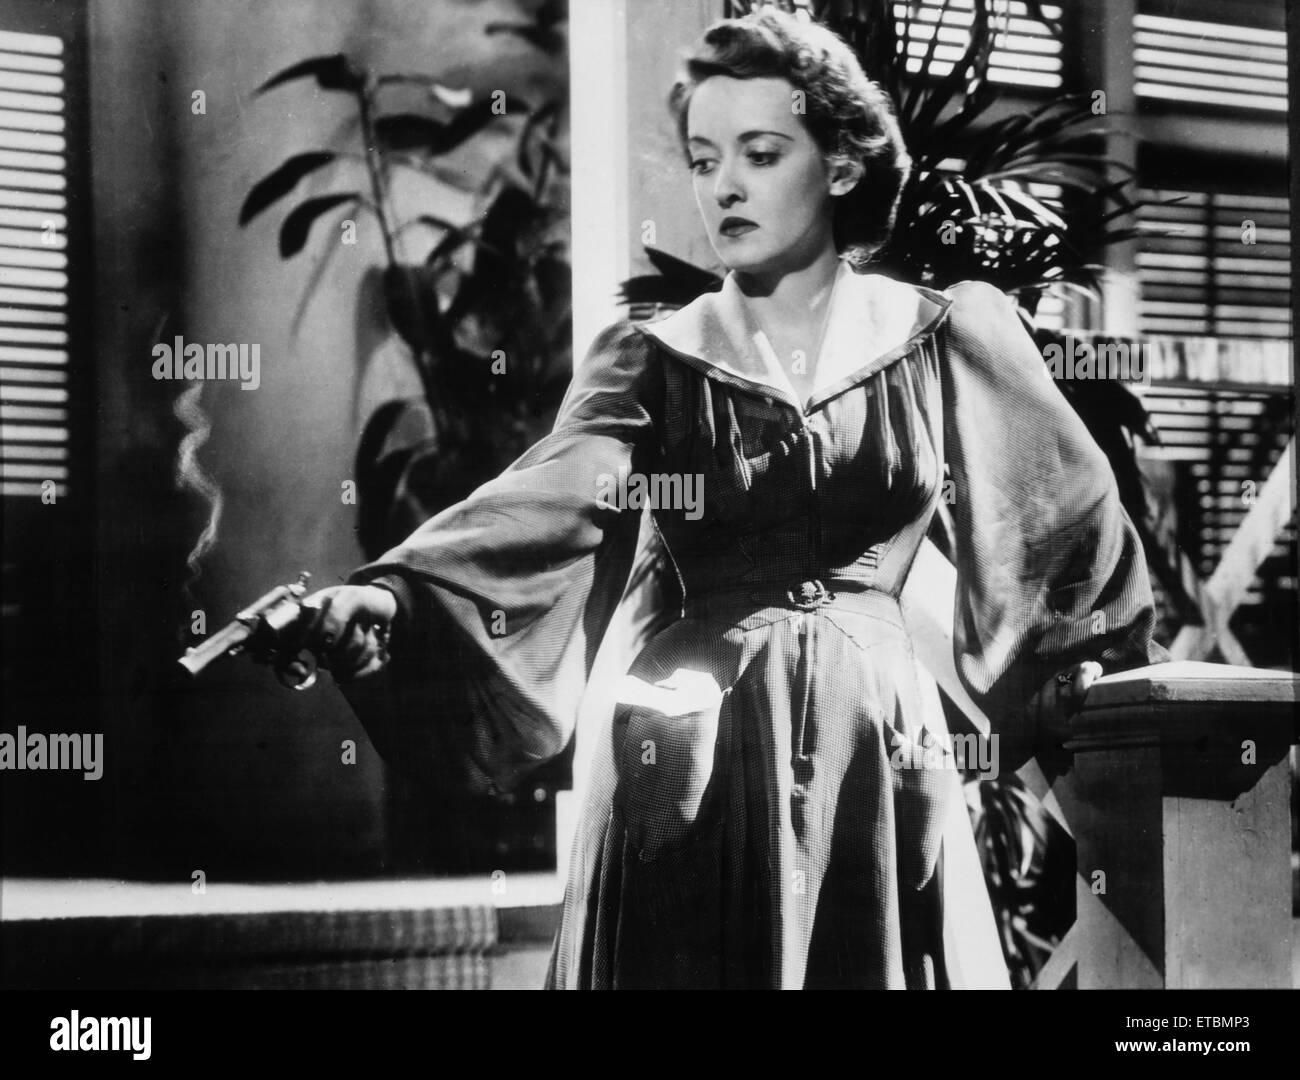 Bette Davis on set of the